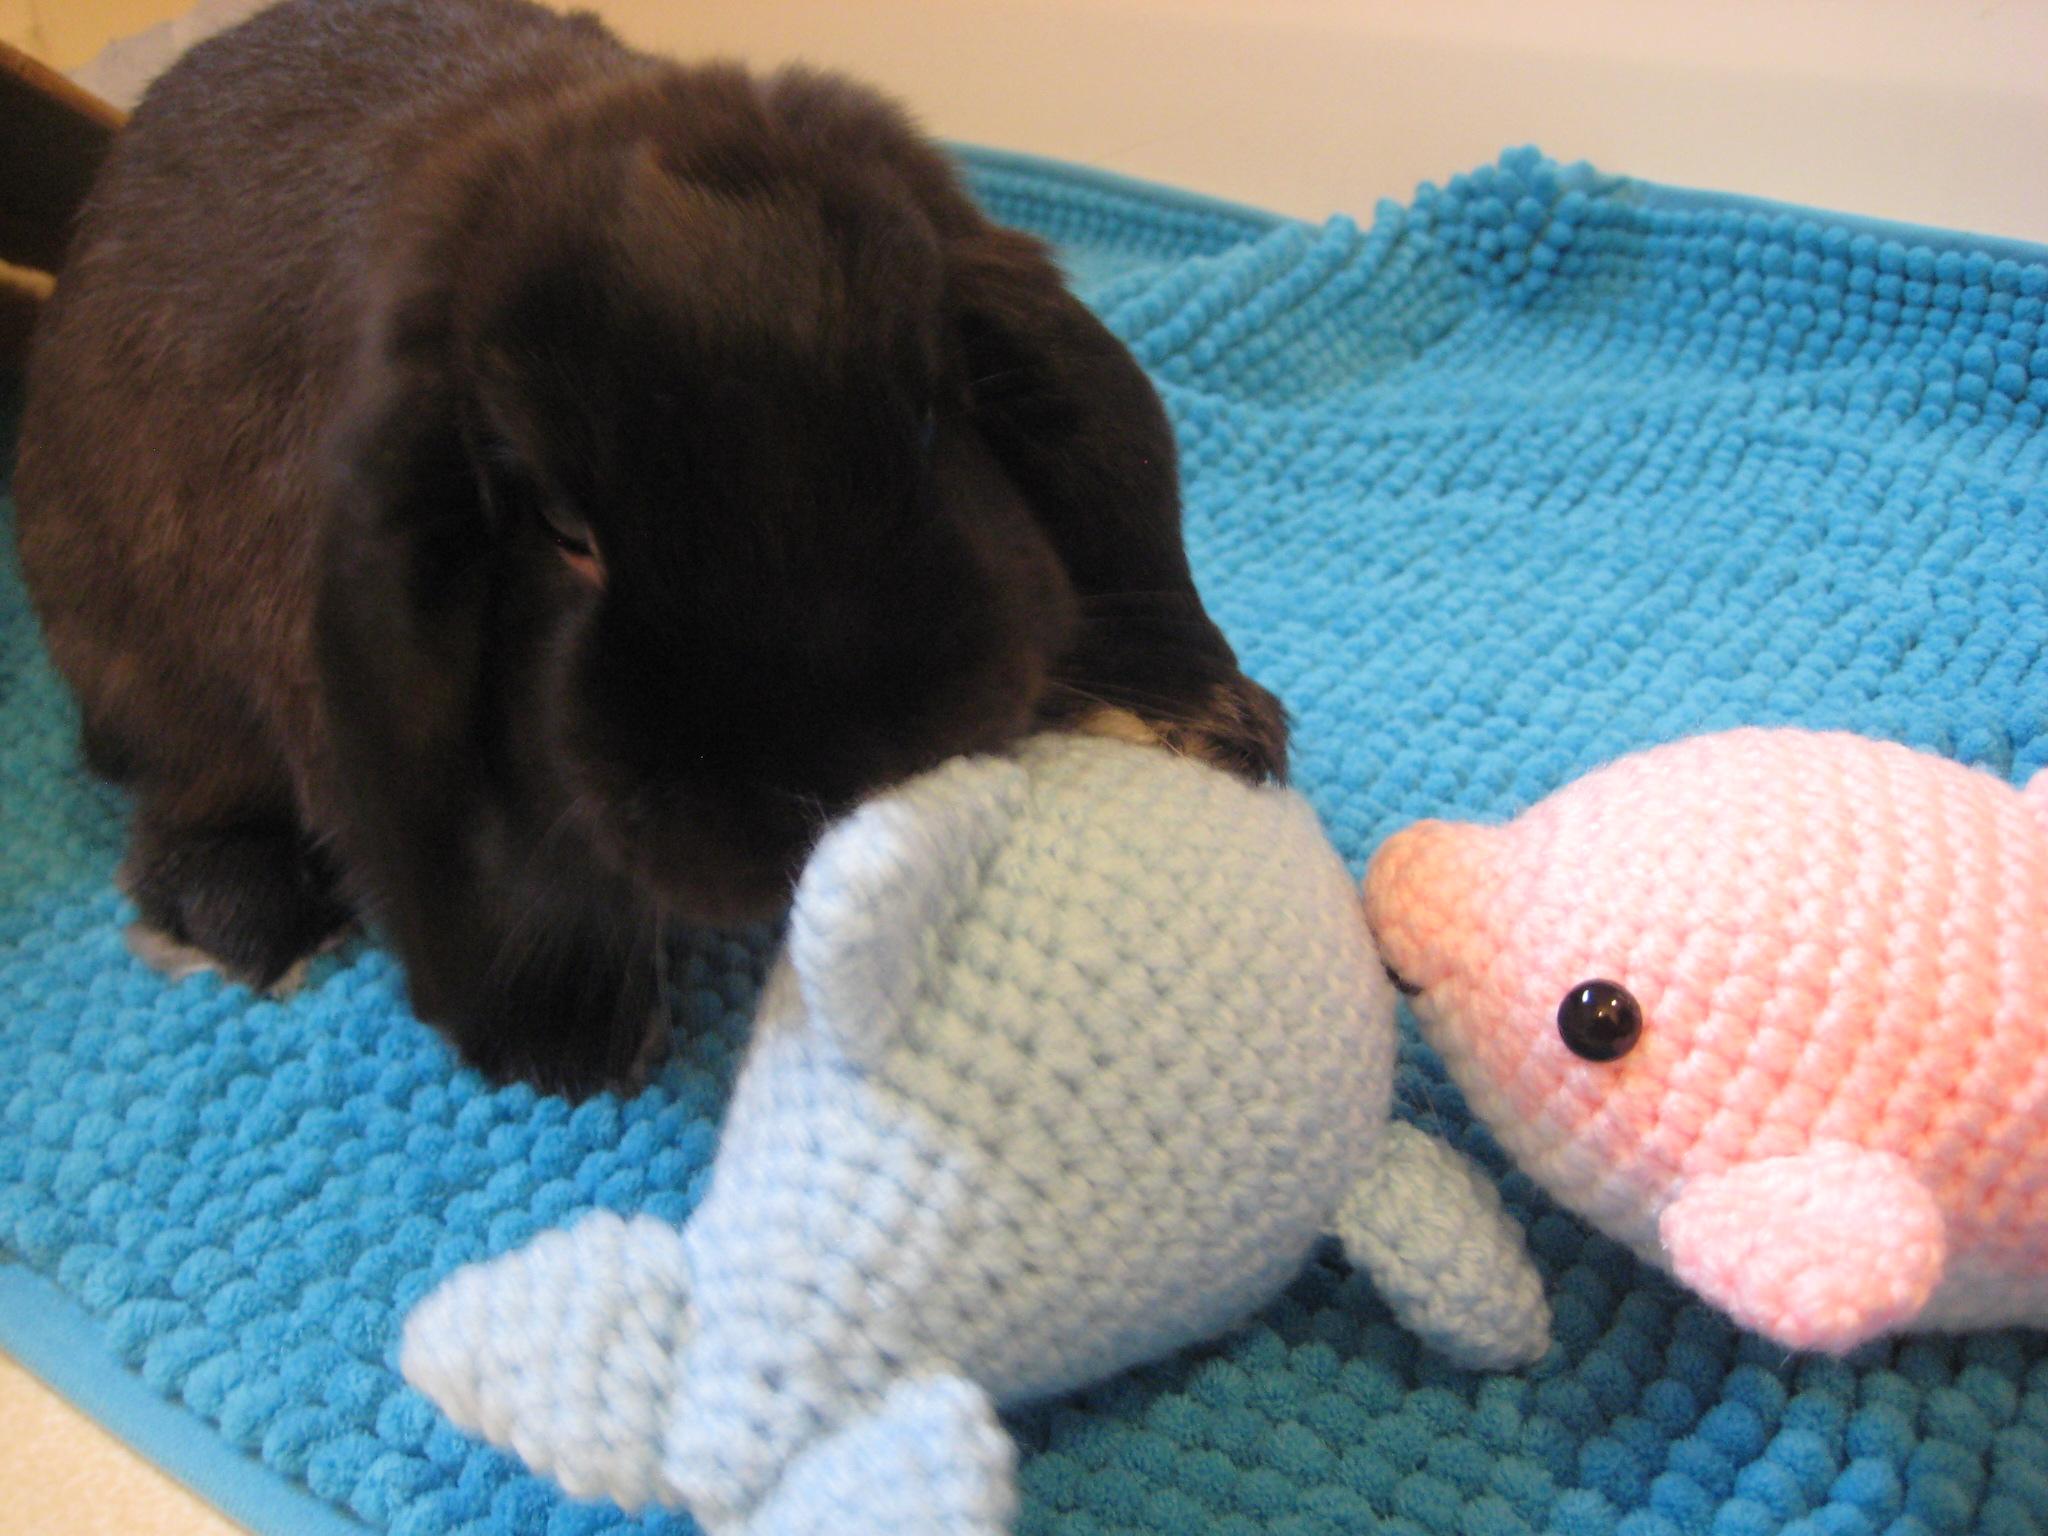 Amigurumi Crochet Definition : Awkward Soul Crochet Patterns Amigurumi Cuteness Auto ...